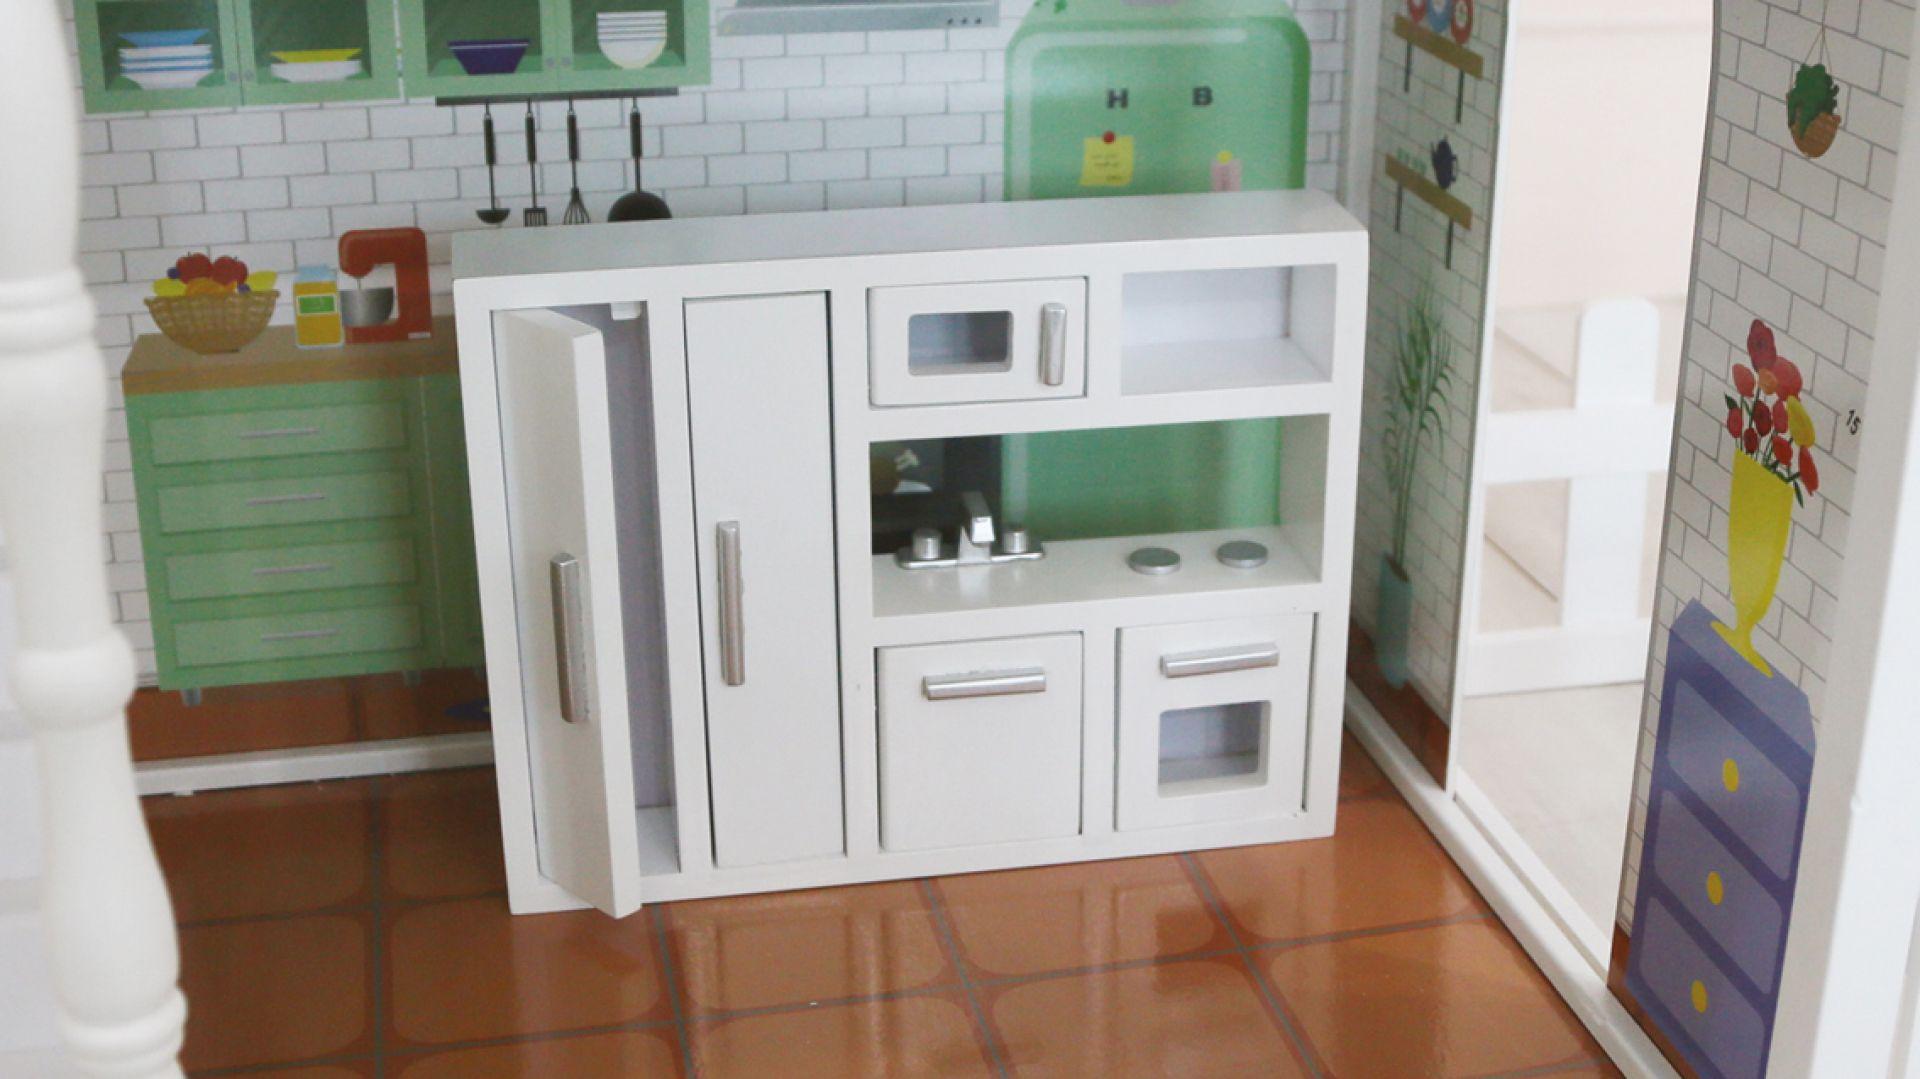 Drewniany domek dla lalek Monika. Fot. 4iQ